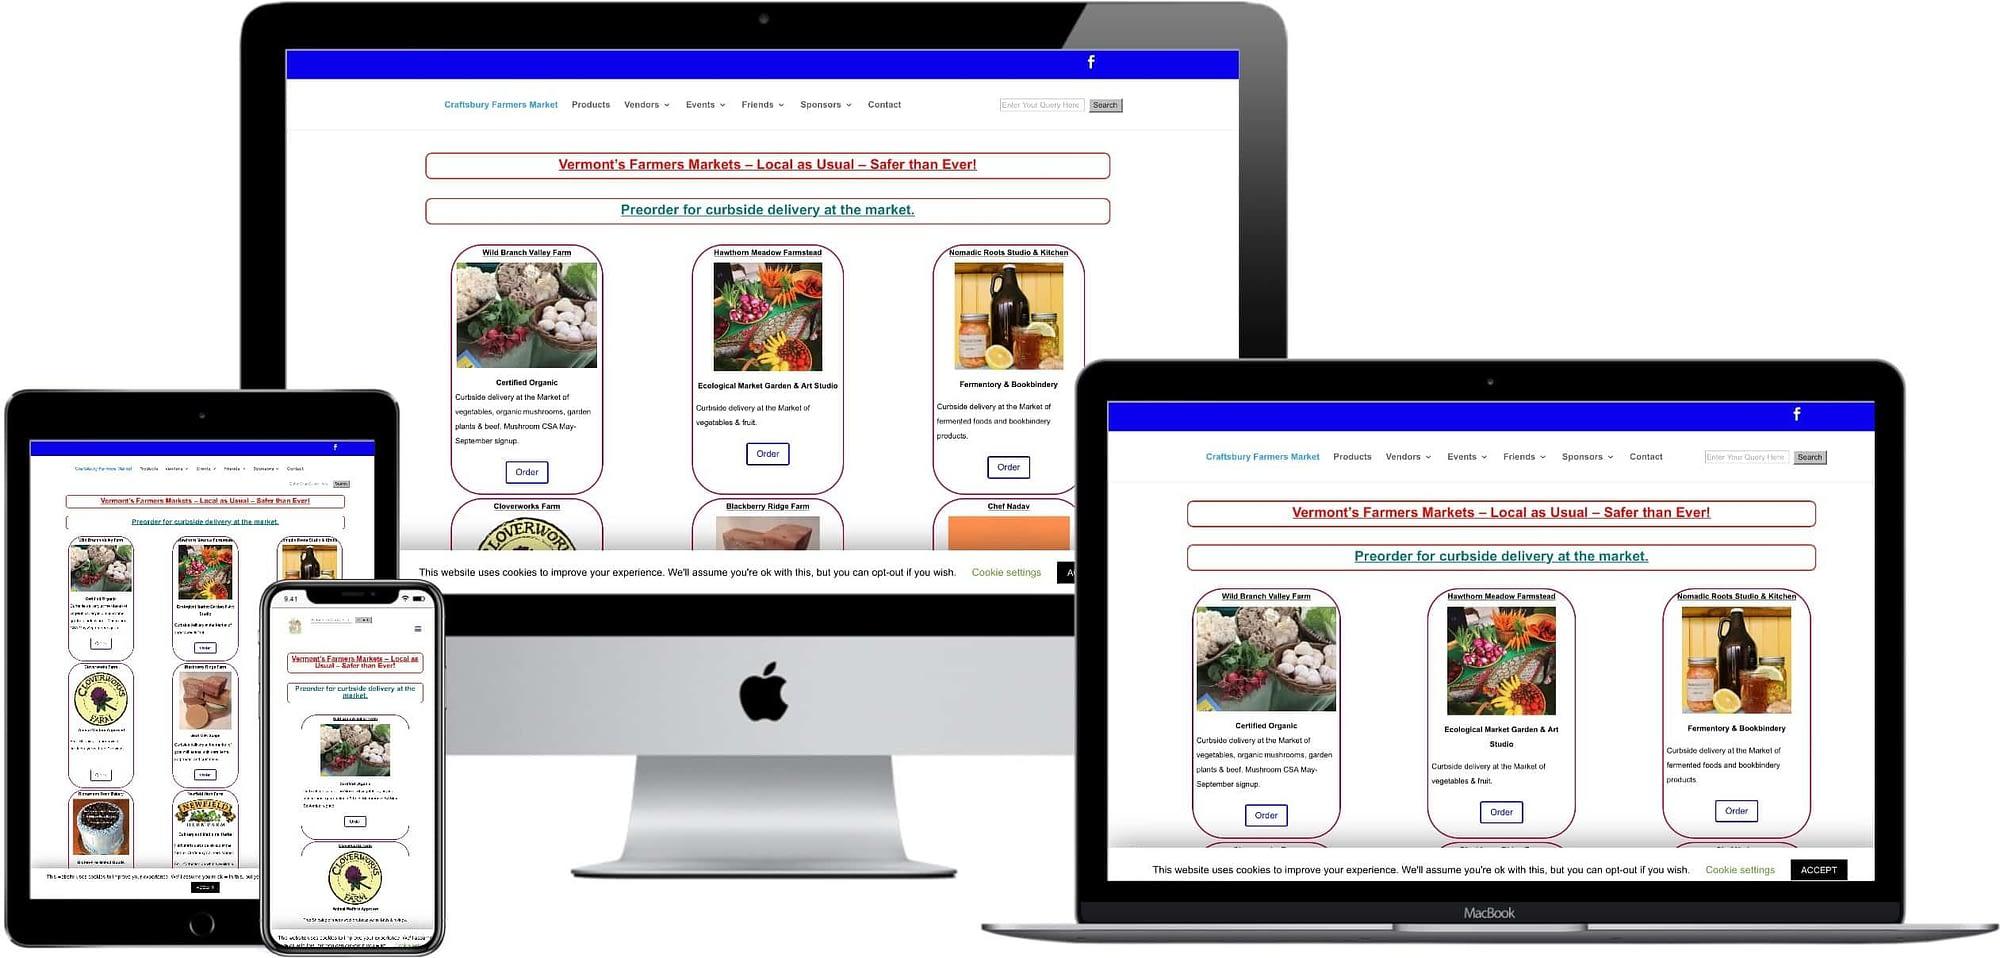 responsive web design - Craftsbury Farmers Market